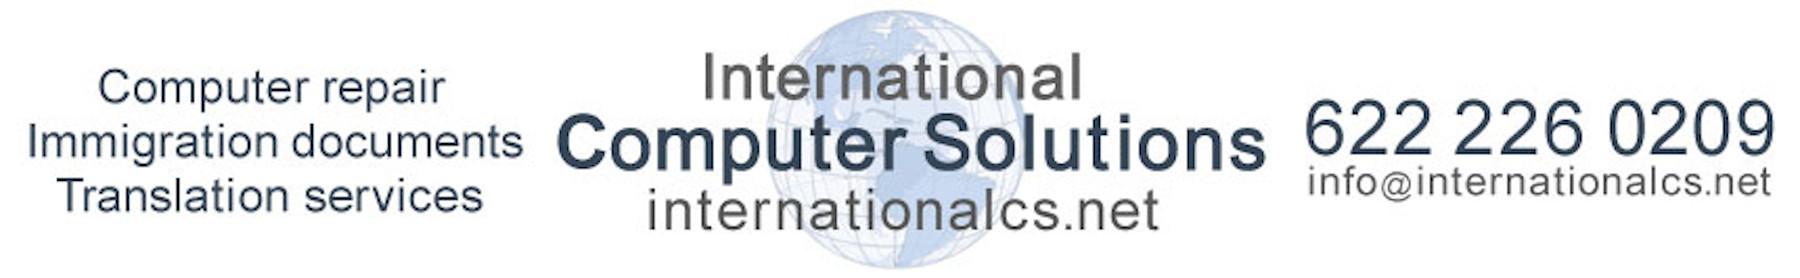 International Computer Solutions